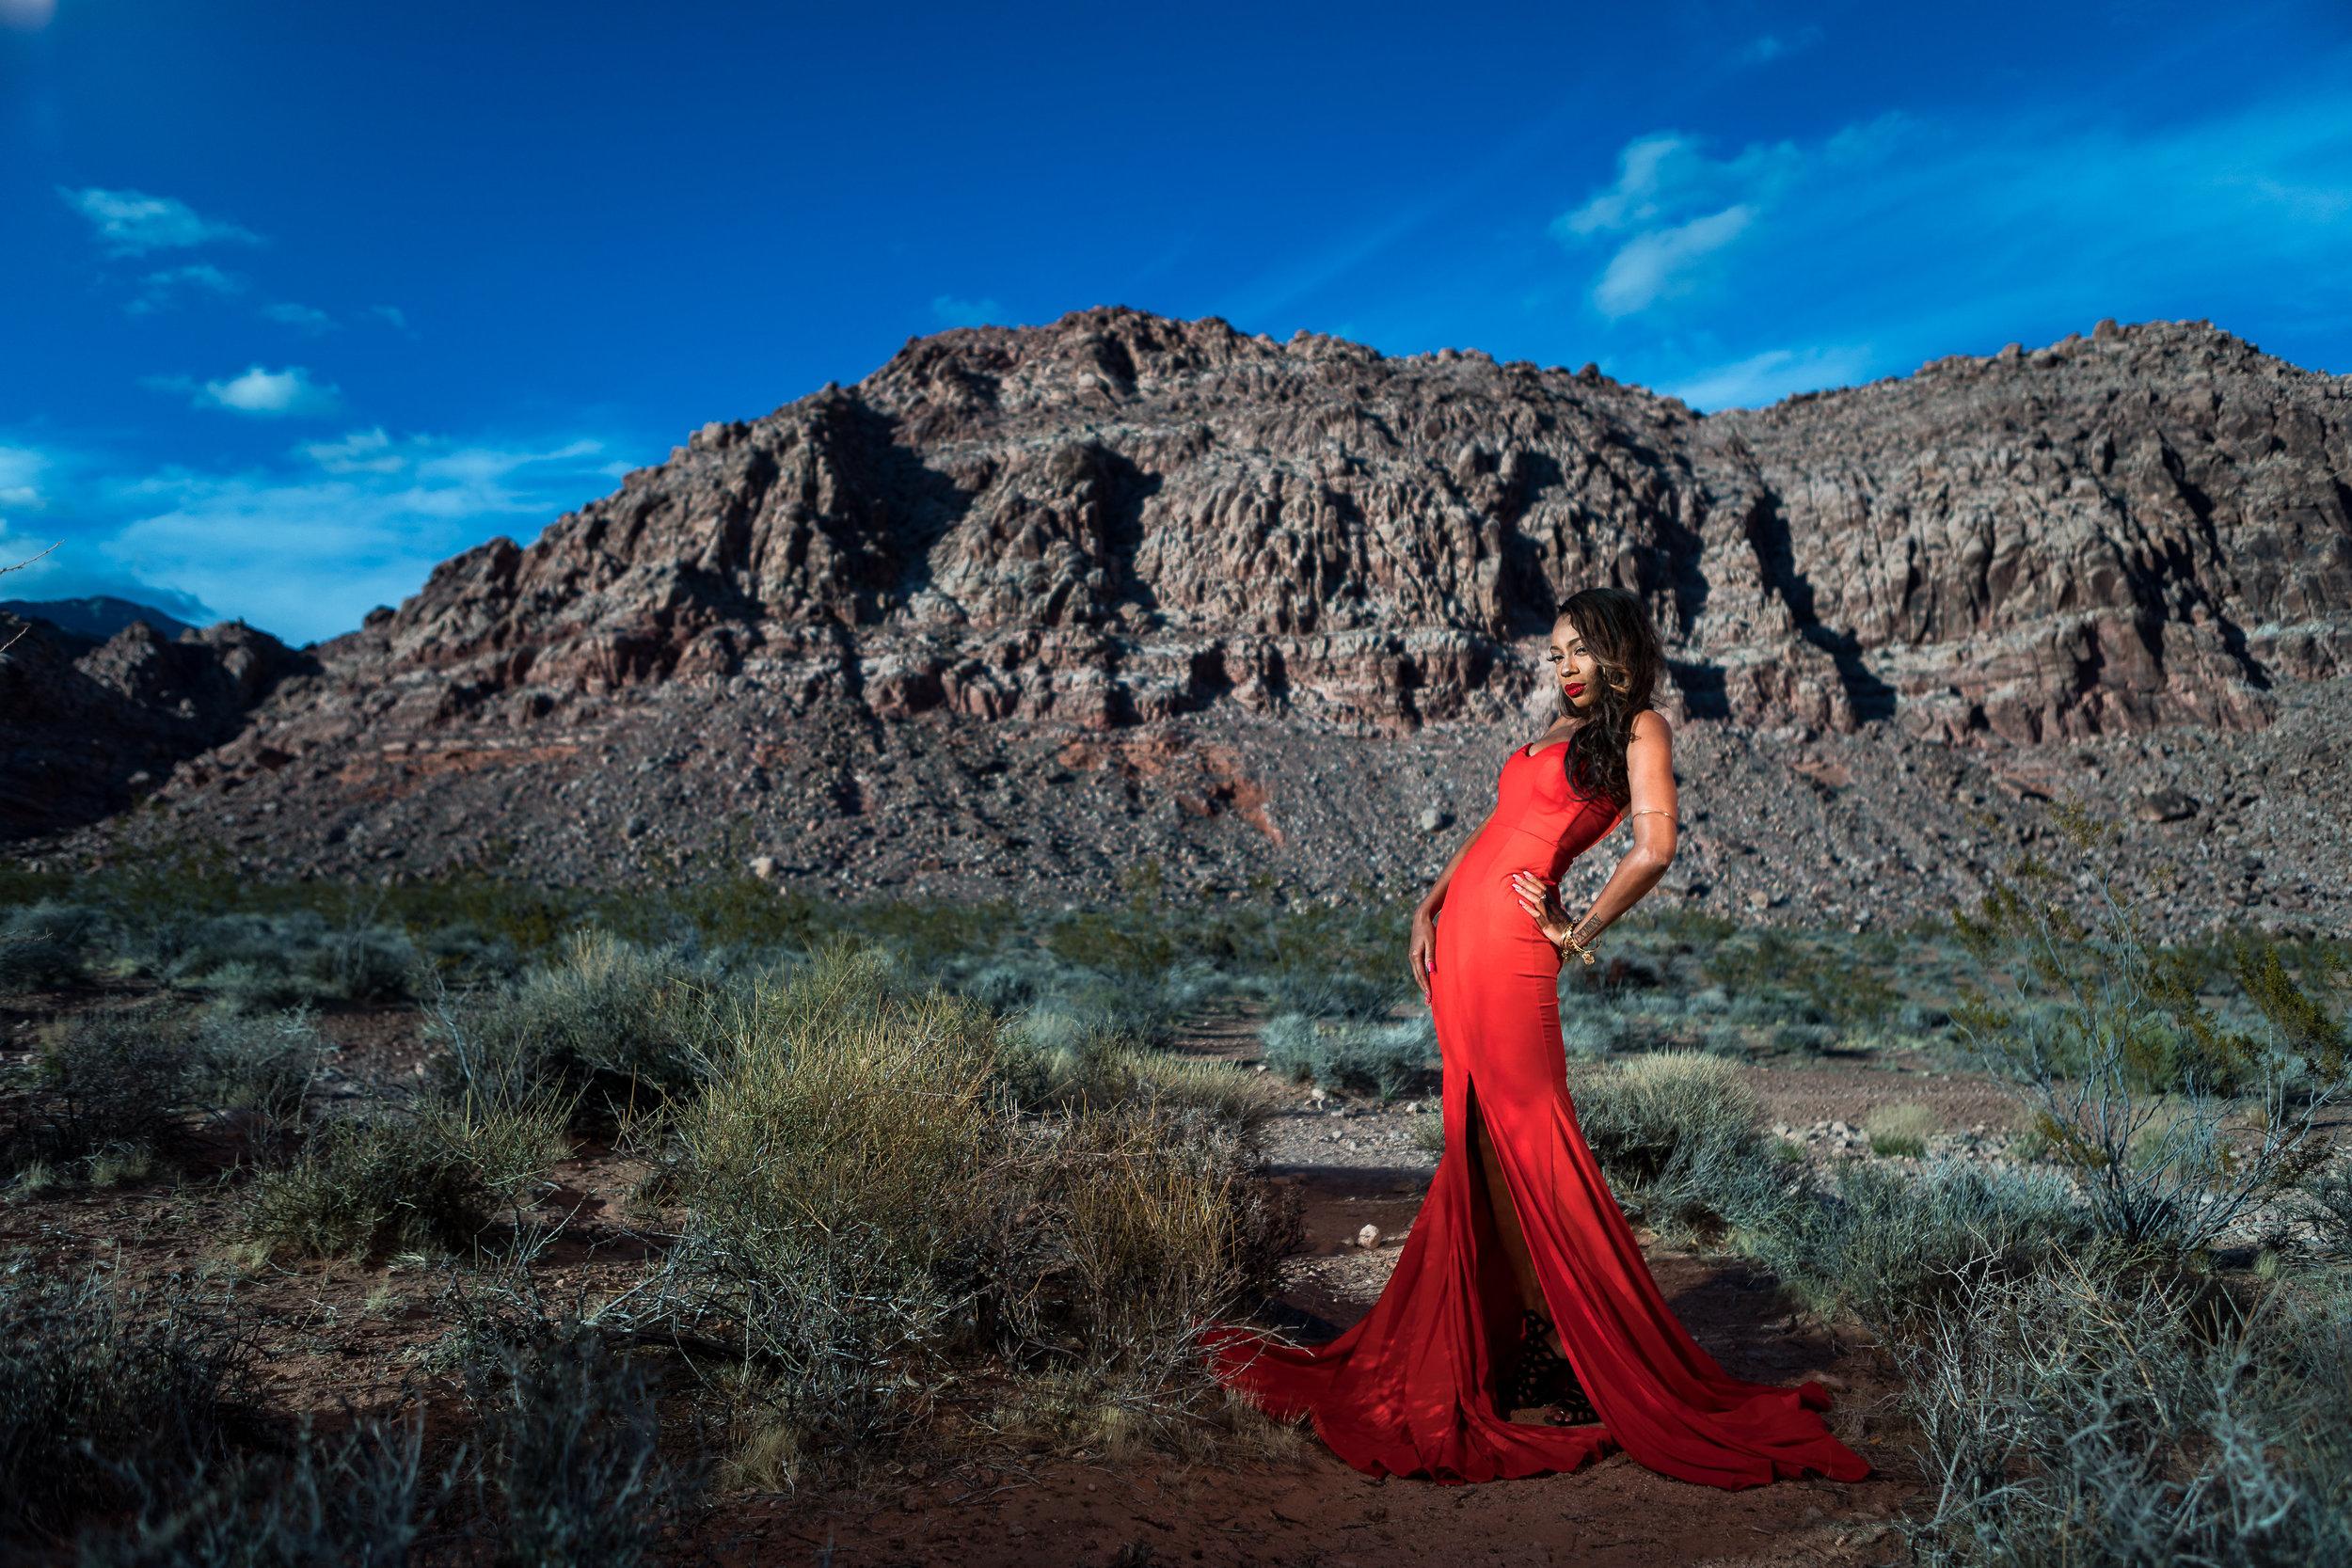 New_York_Photographer_Las_Vegas_Desert-252.jpg